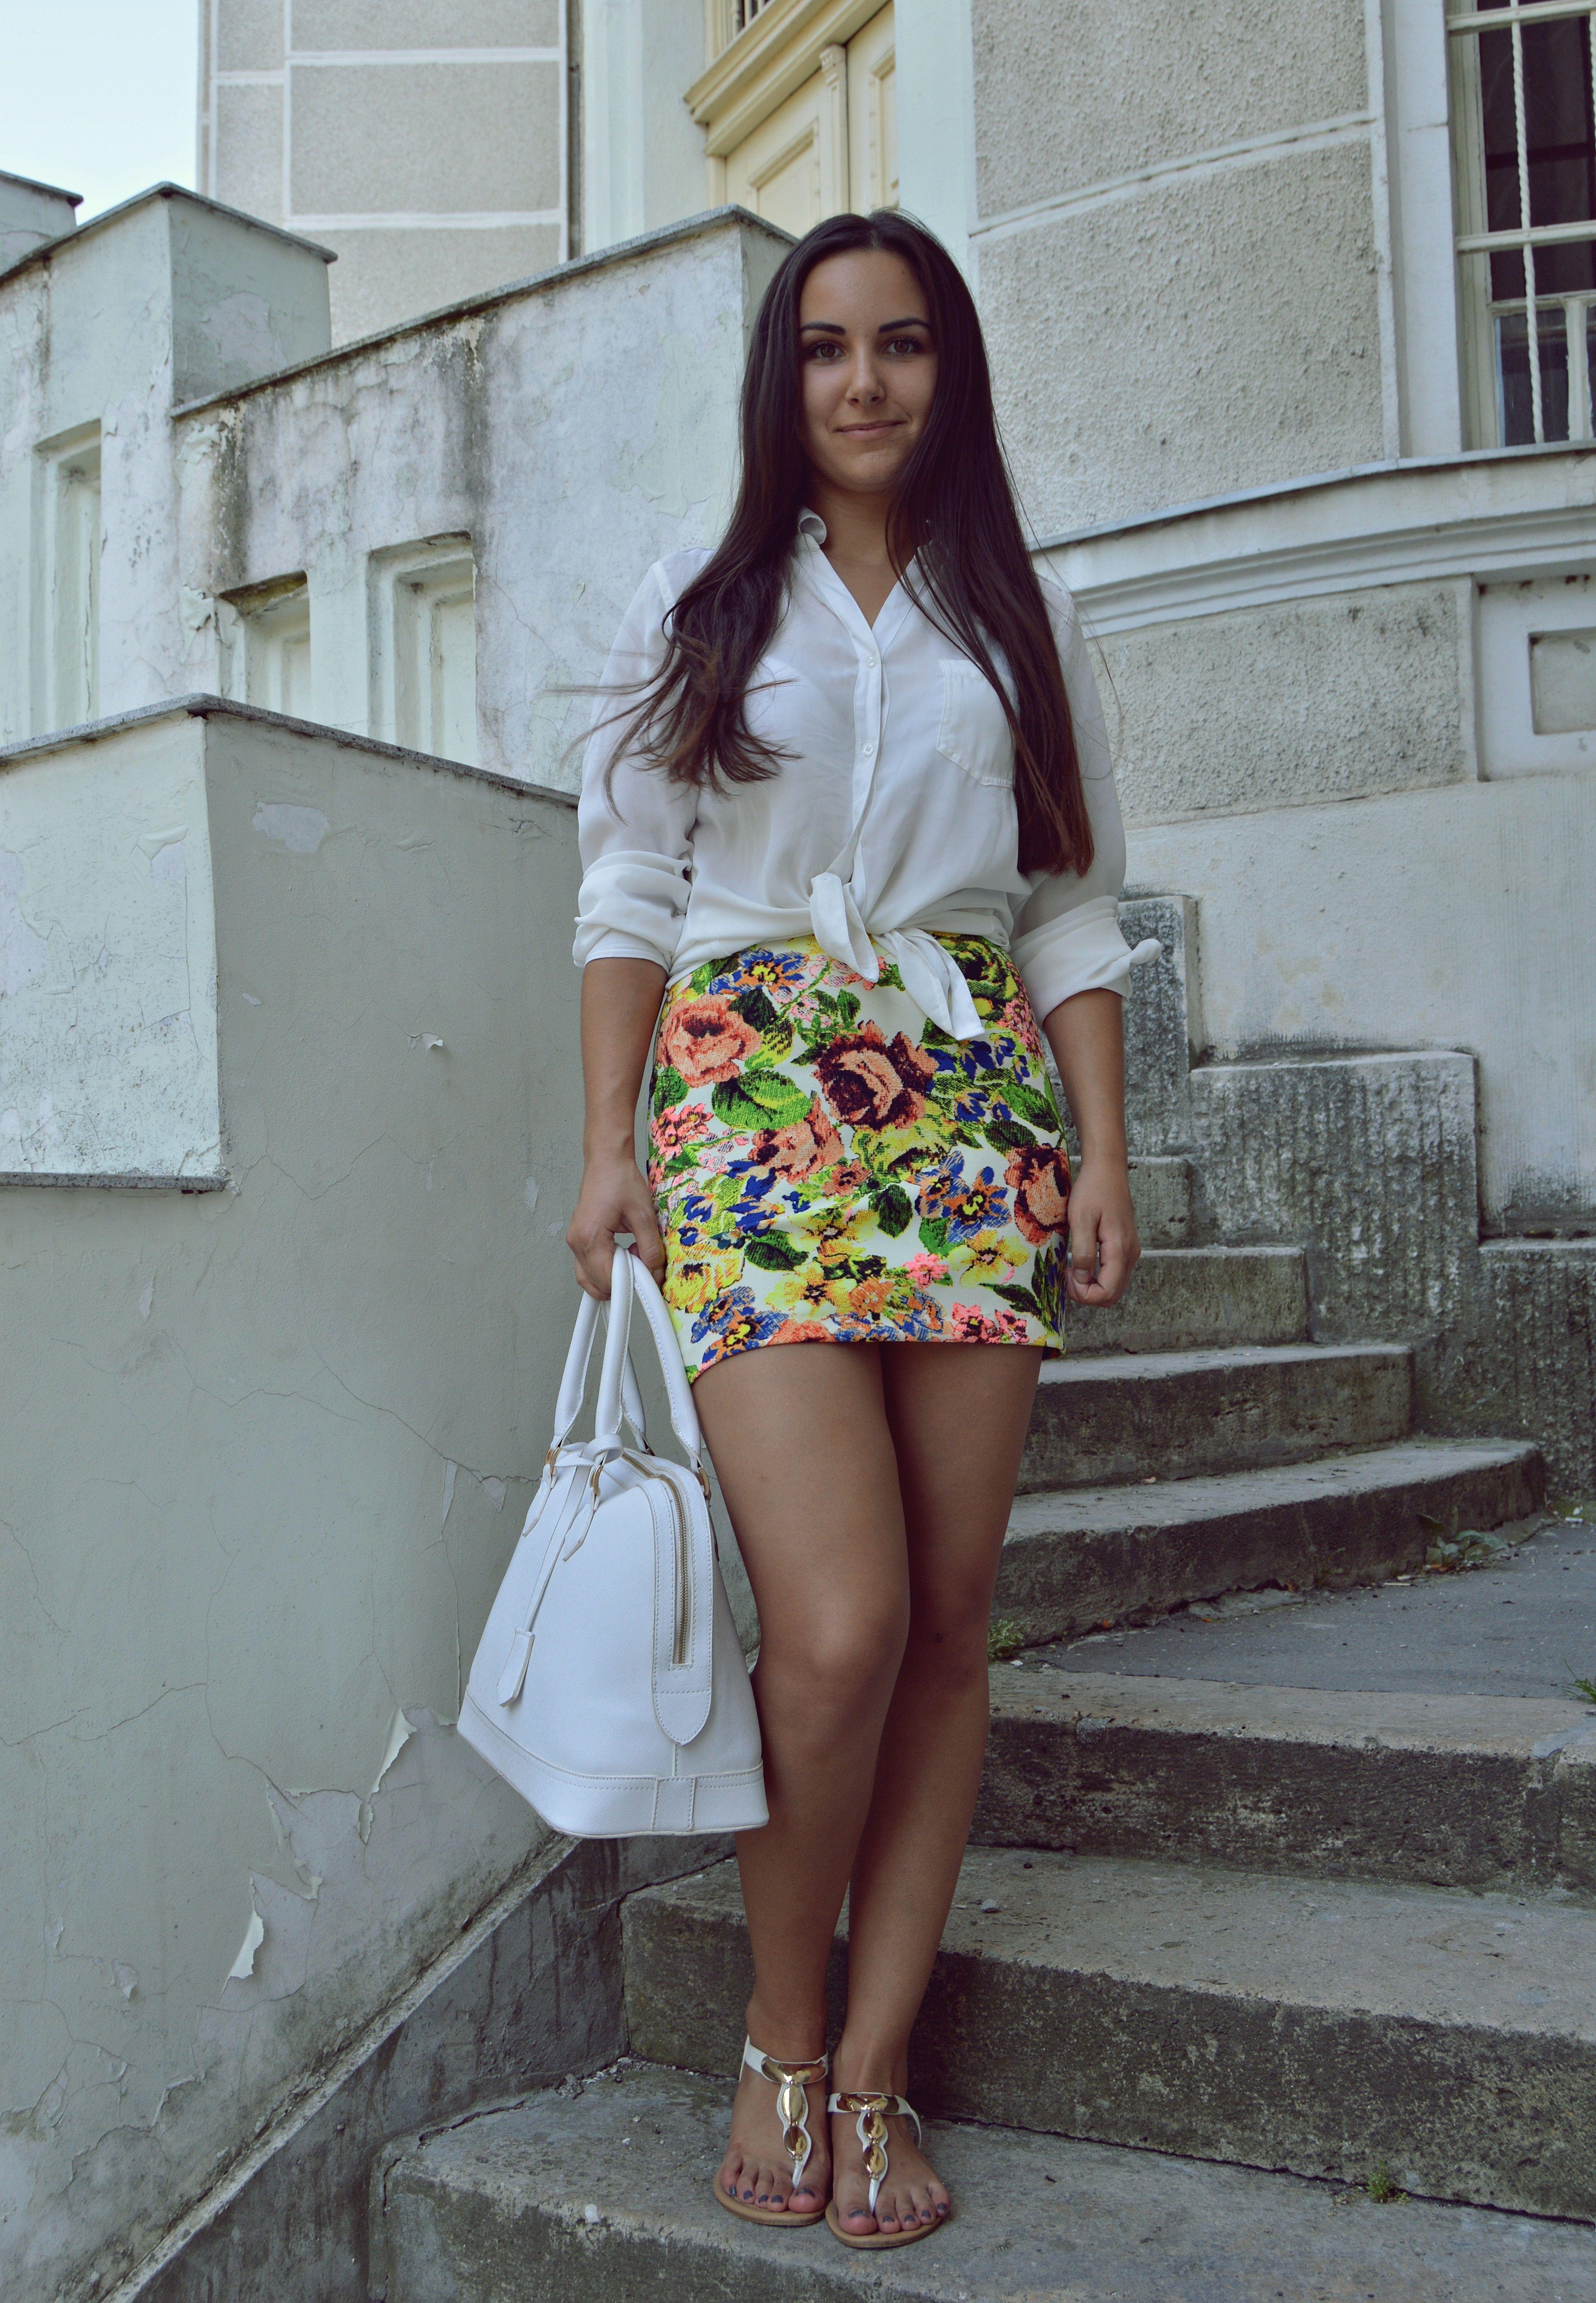 Floral print, florals, skirt, outfit, summer, white, basic  http://blogalinapop.wordpress.com/